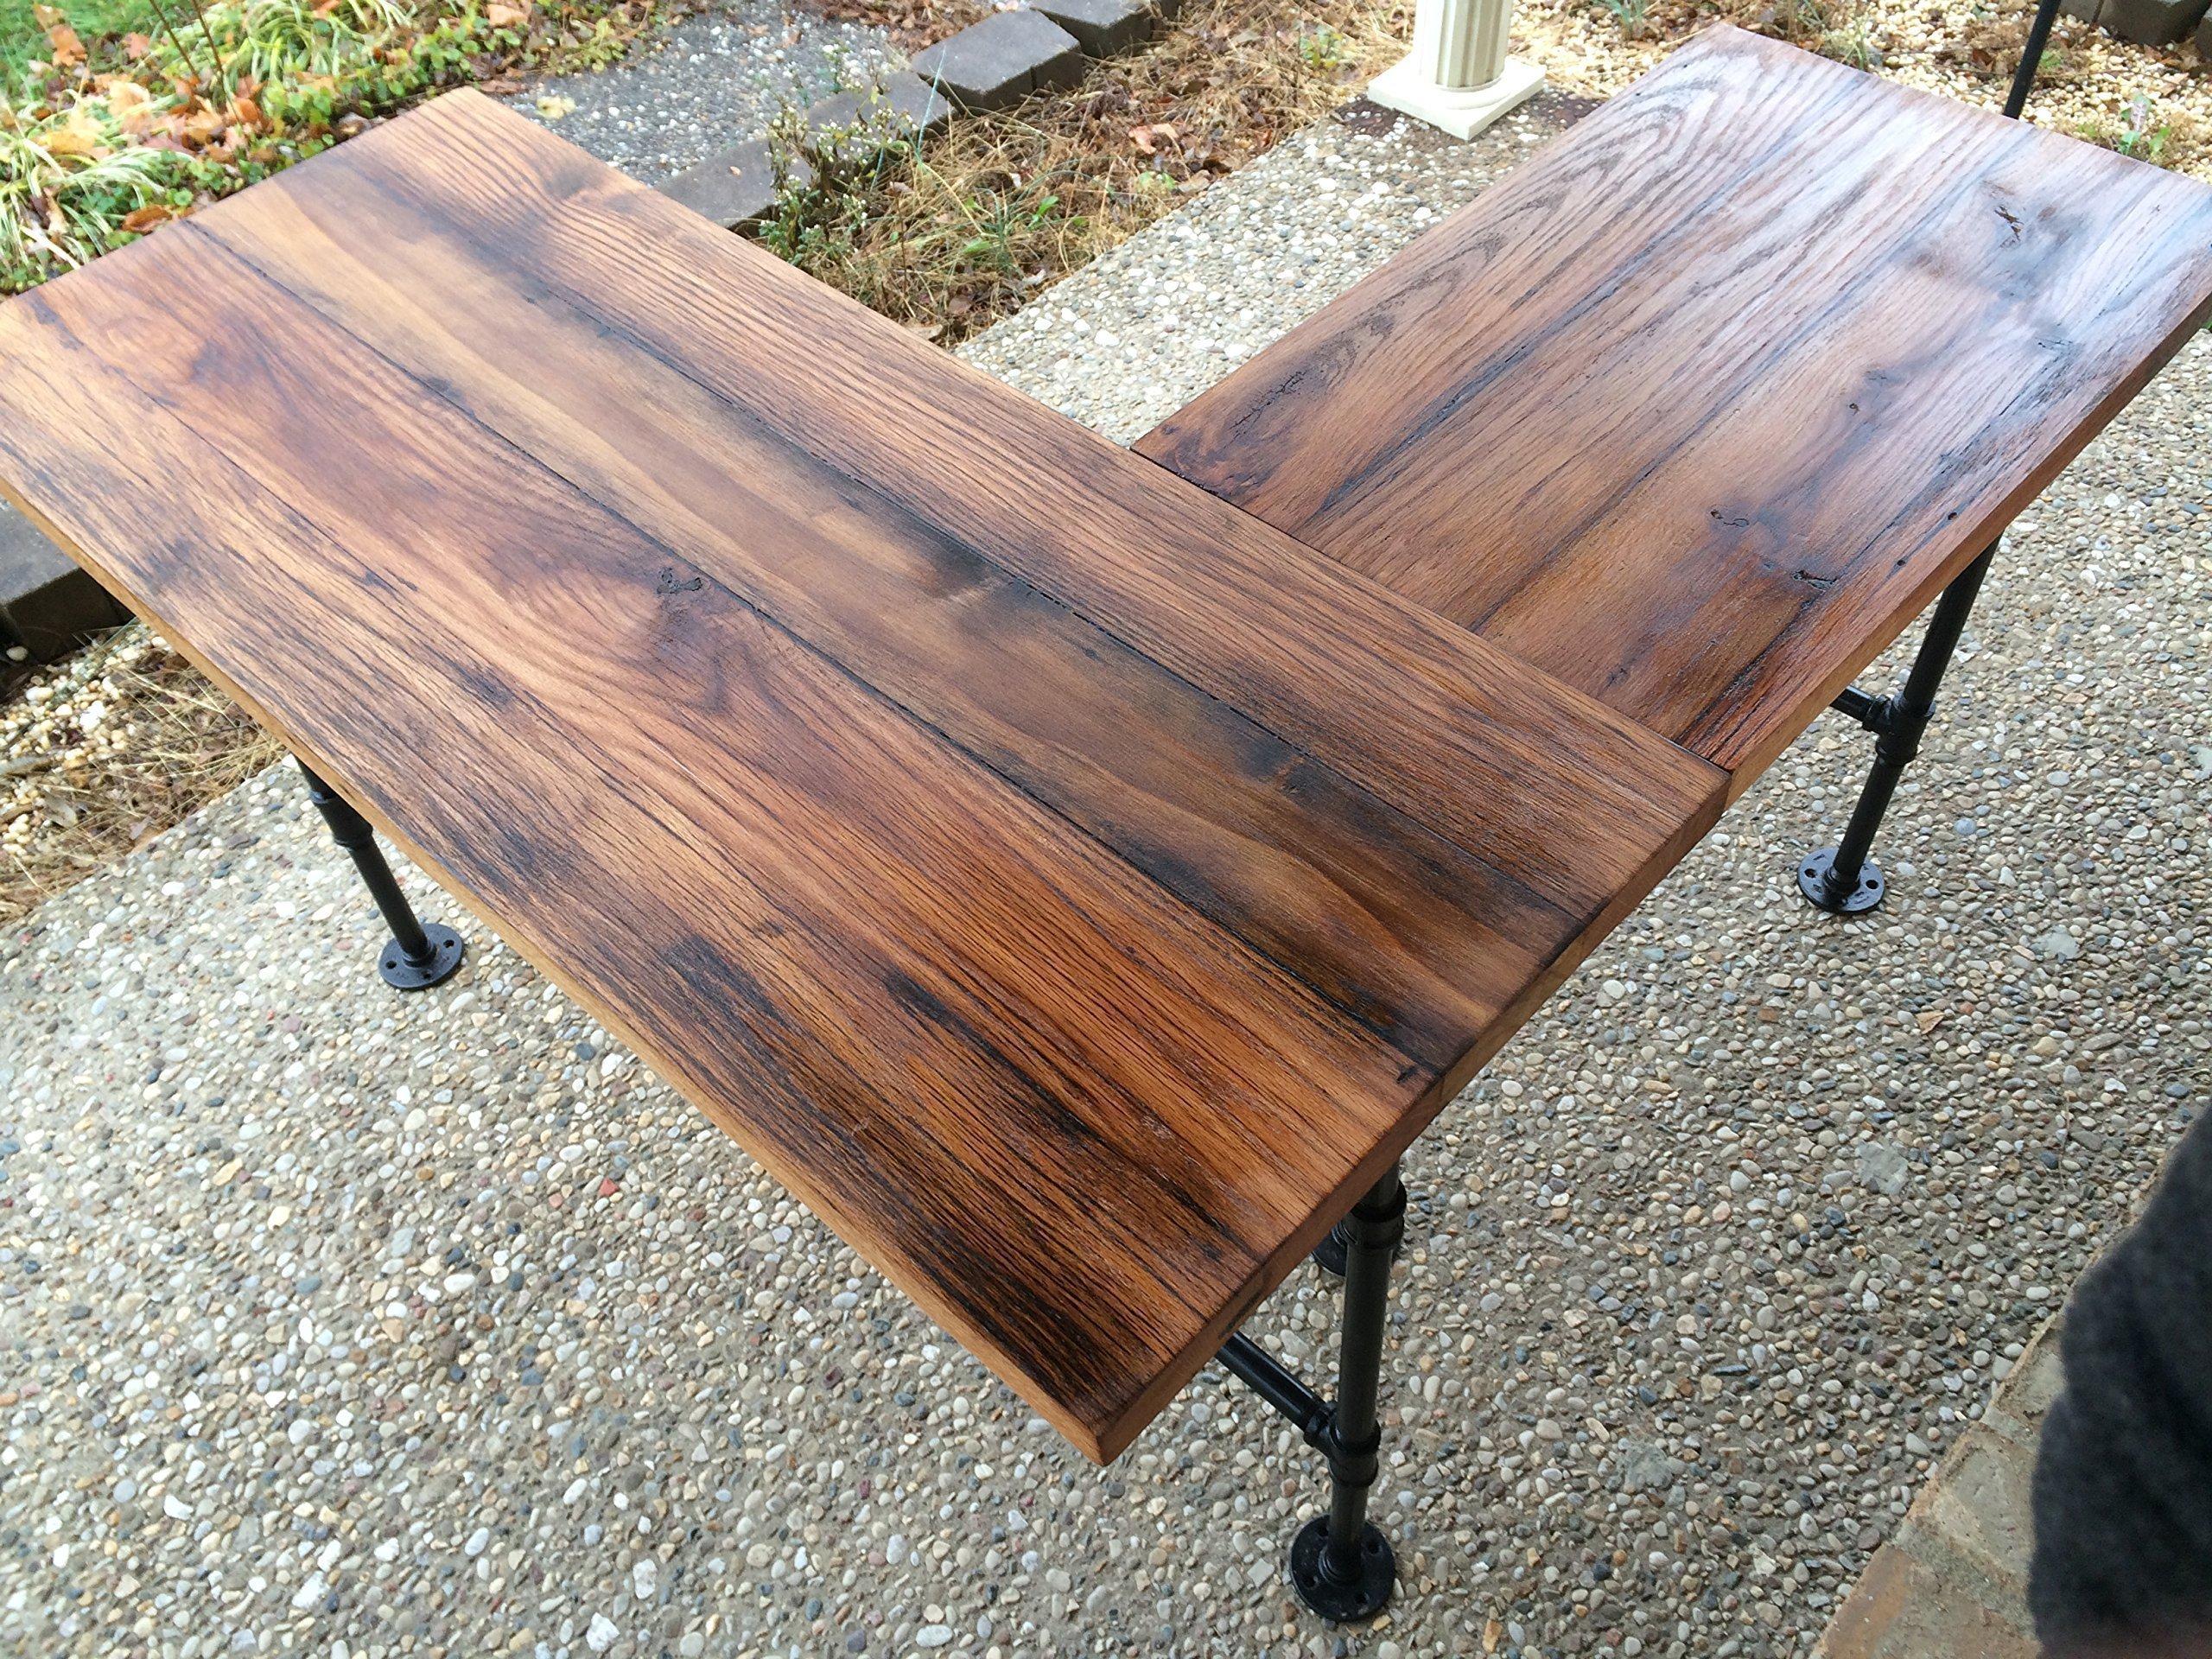 "Rustic Reclaimed Barn Wood L Desk Table - Solid Oak W/ 28"" Black Iron Pipe legs. -  - writing-desks, living-room-furniture, living-room - A1XeLDsOK2L -"